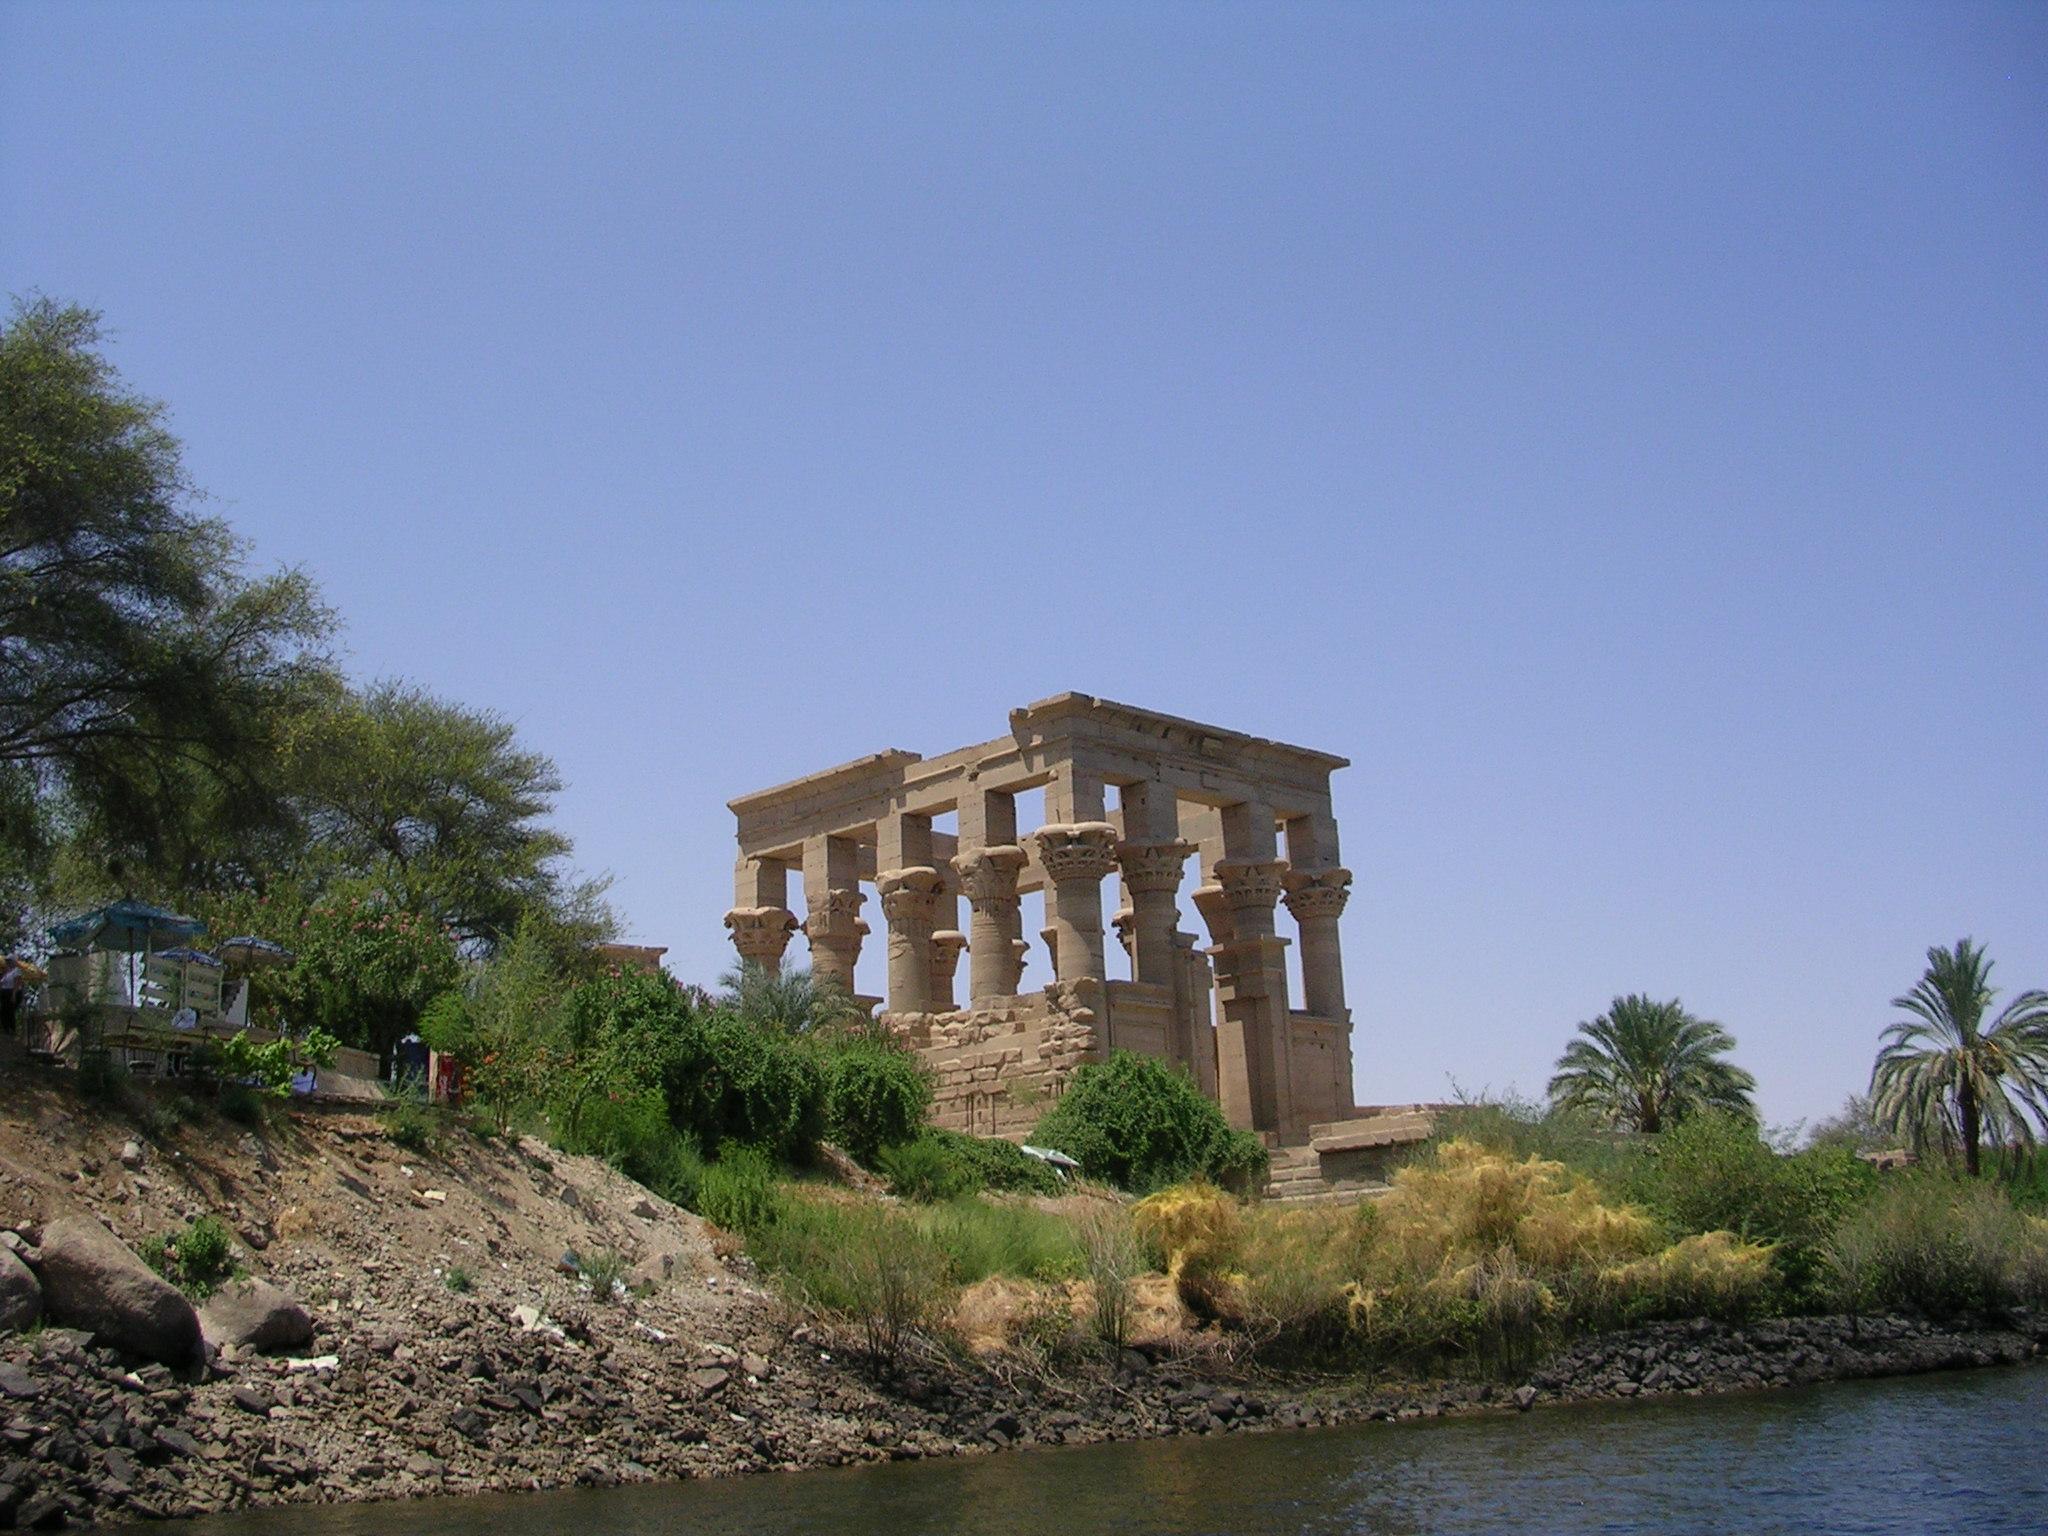 Egypt, Abu, Plants, Temple, Structure, HQ Photo